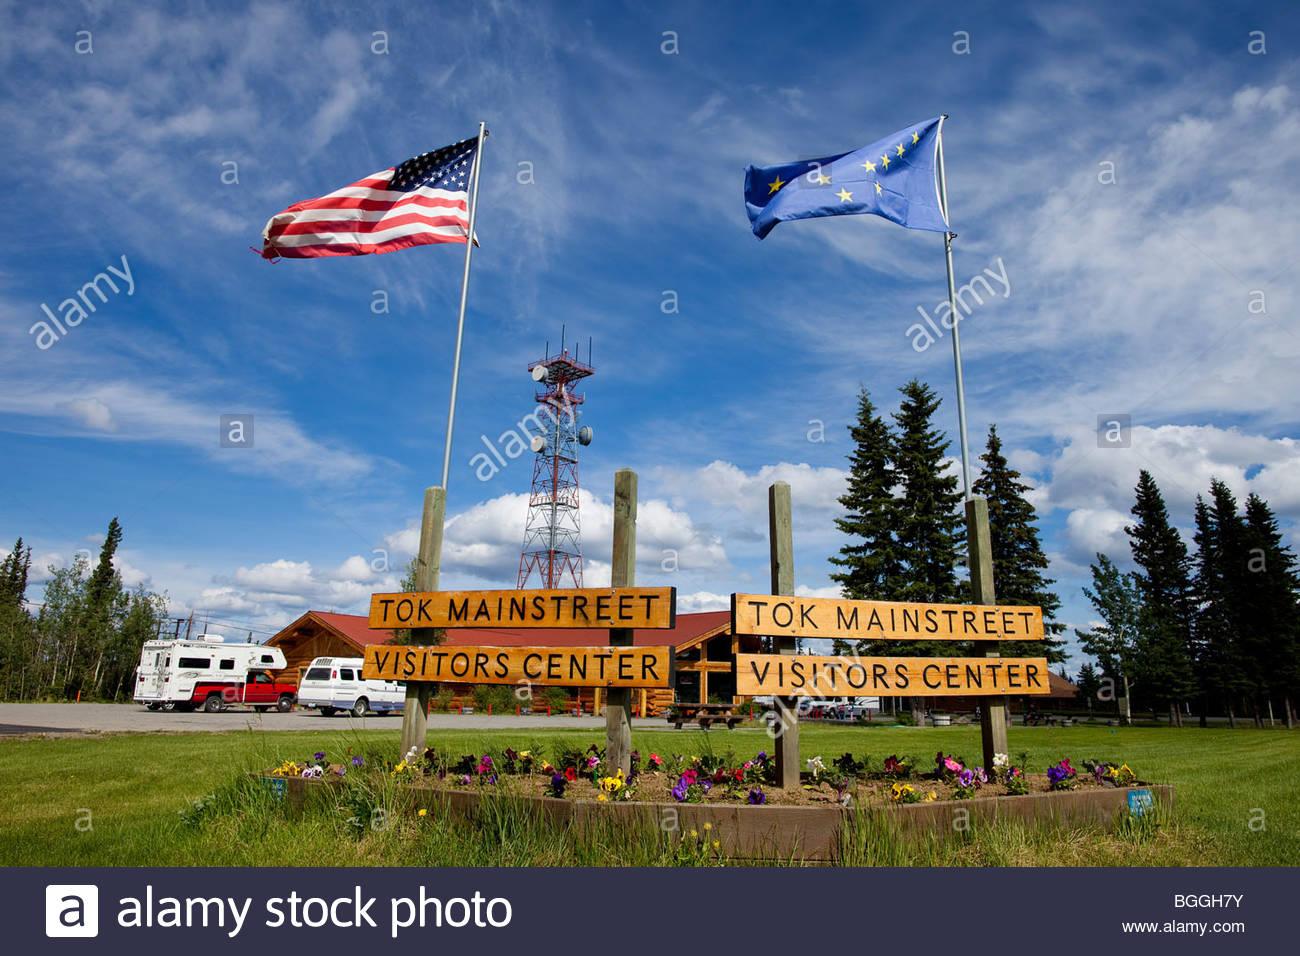 Alaska, Tok. Visitor's Center. - Stock Image